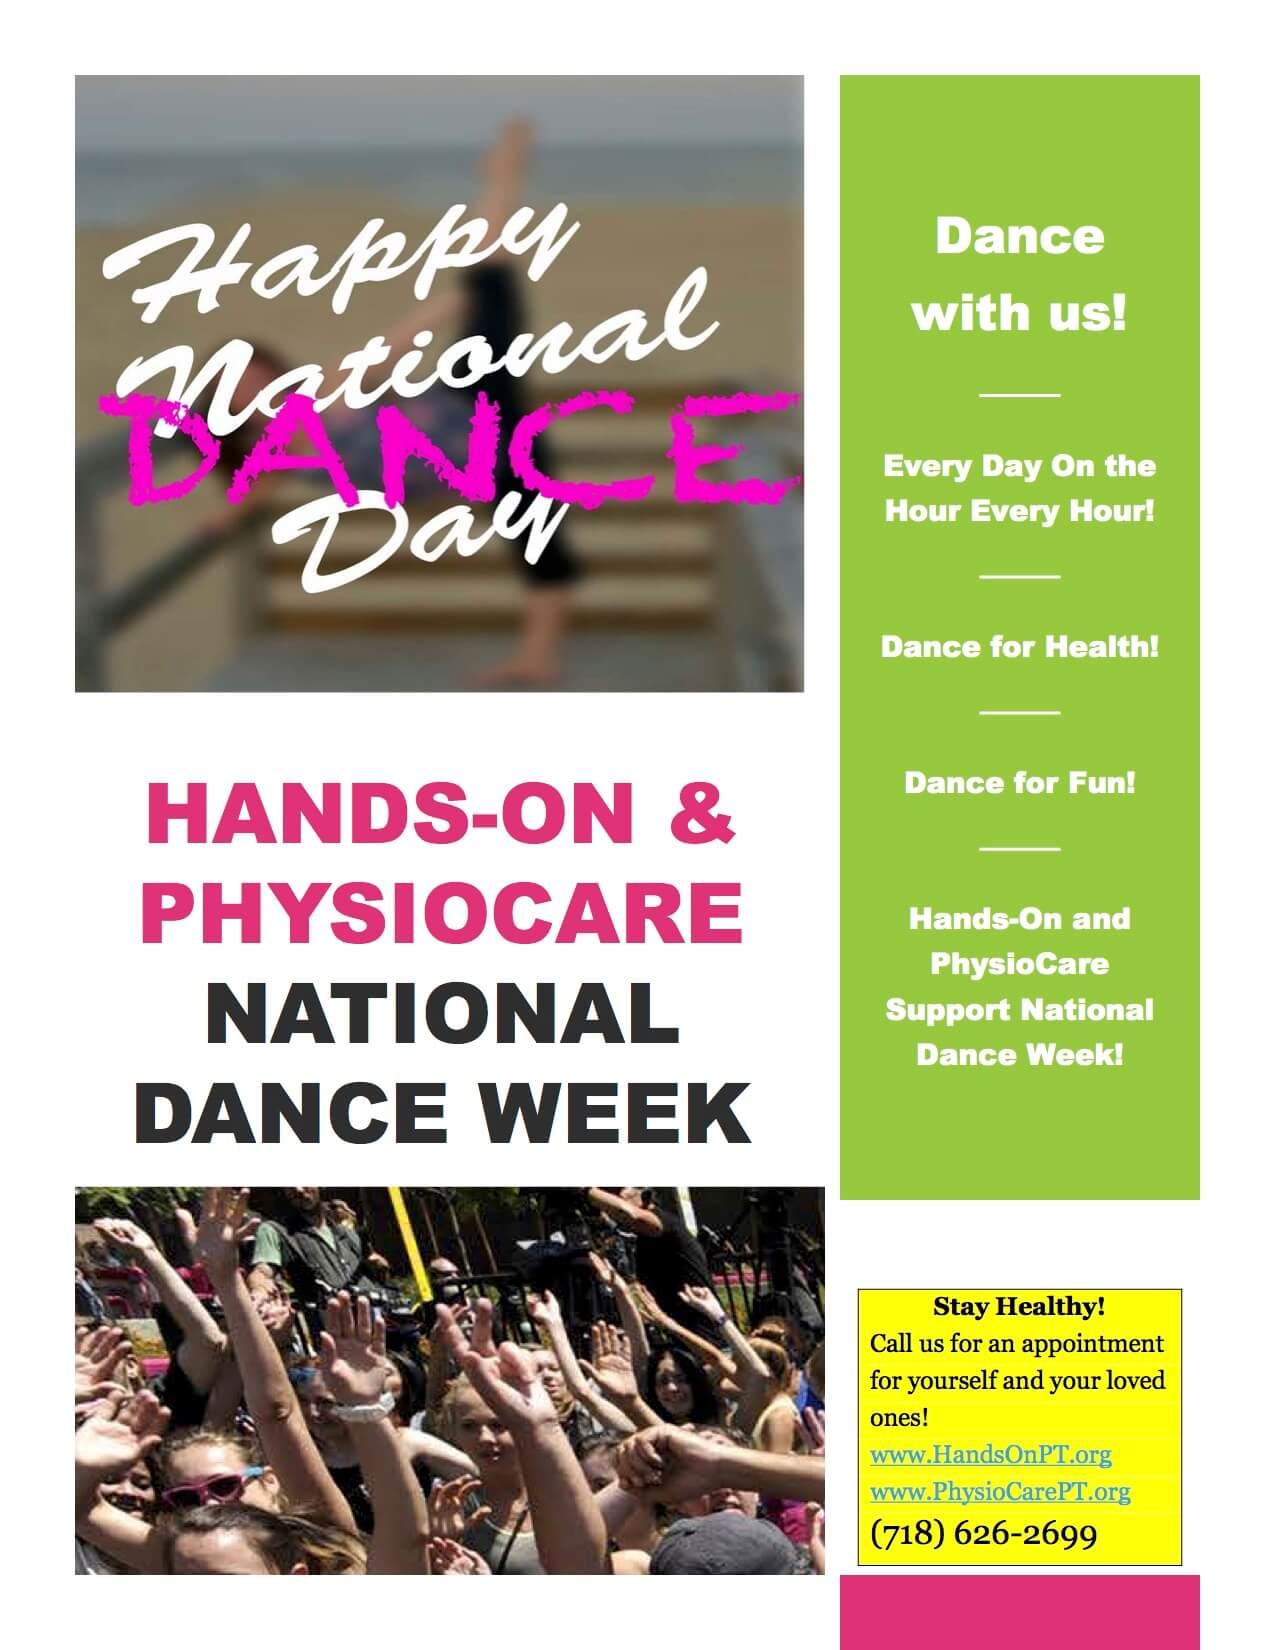 national dance week National Dance Week!